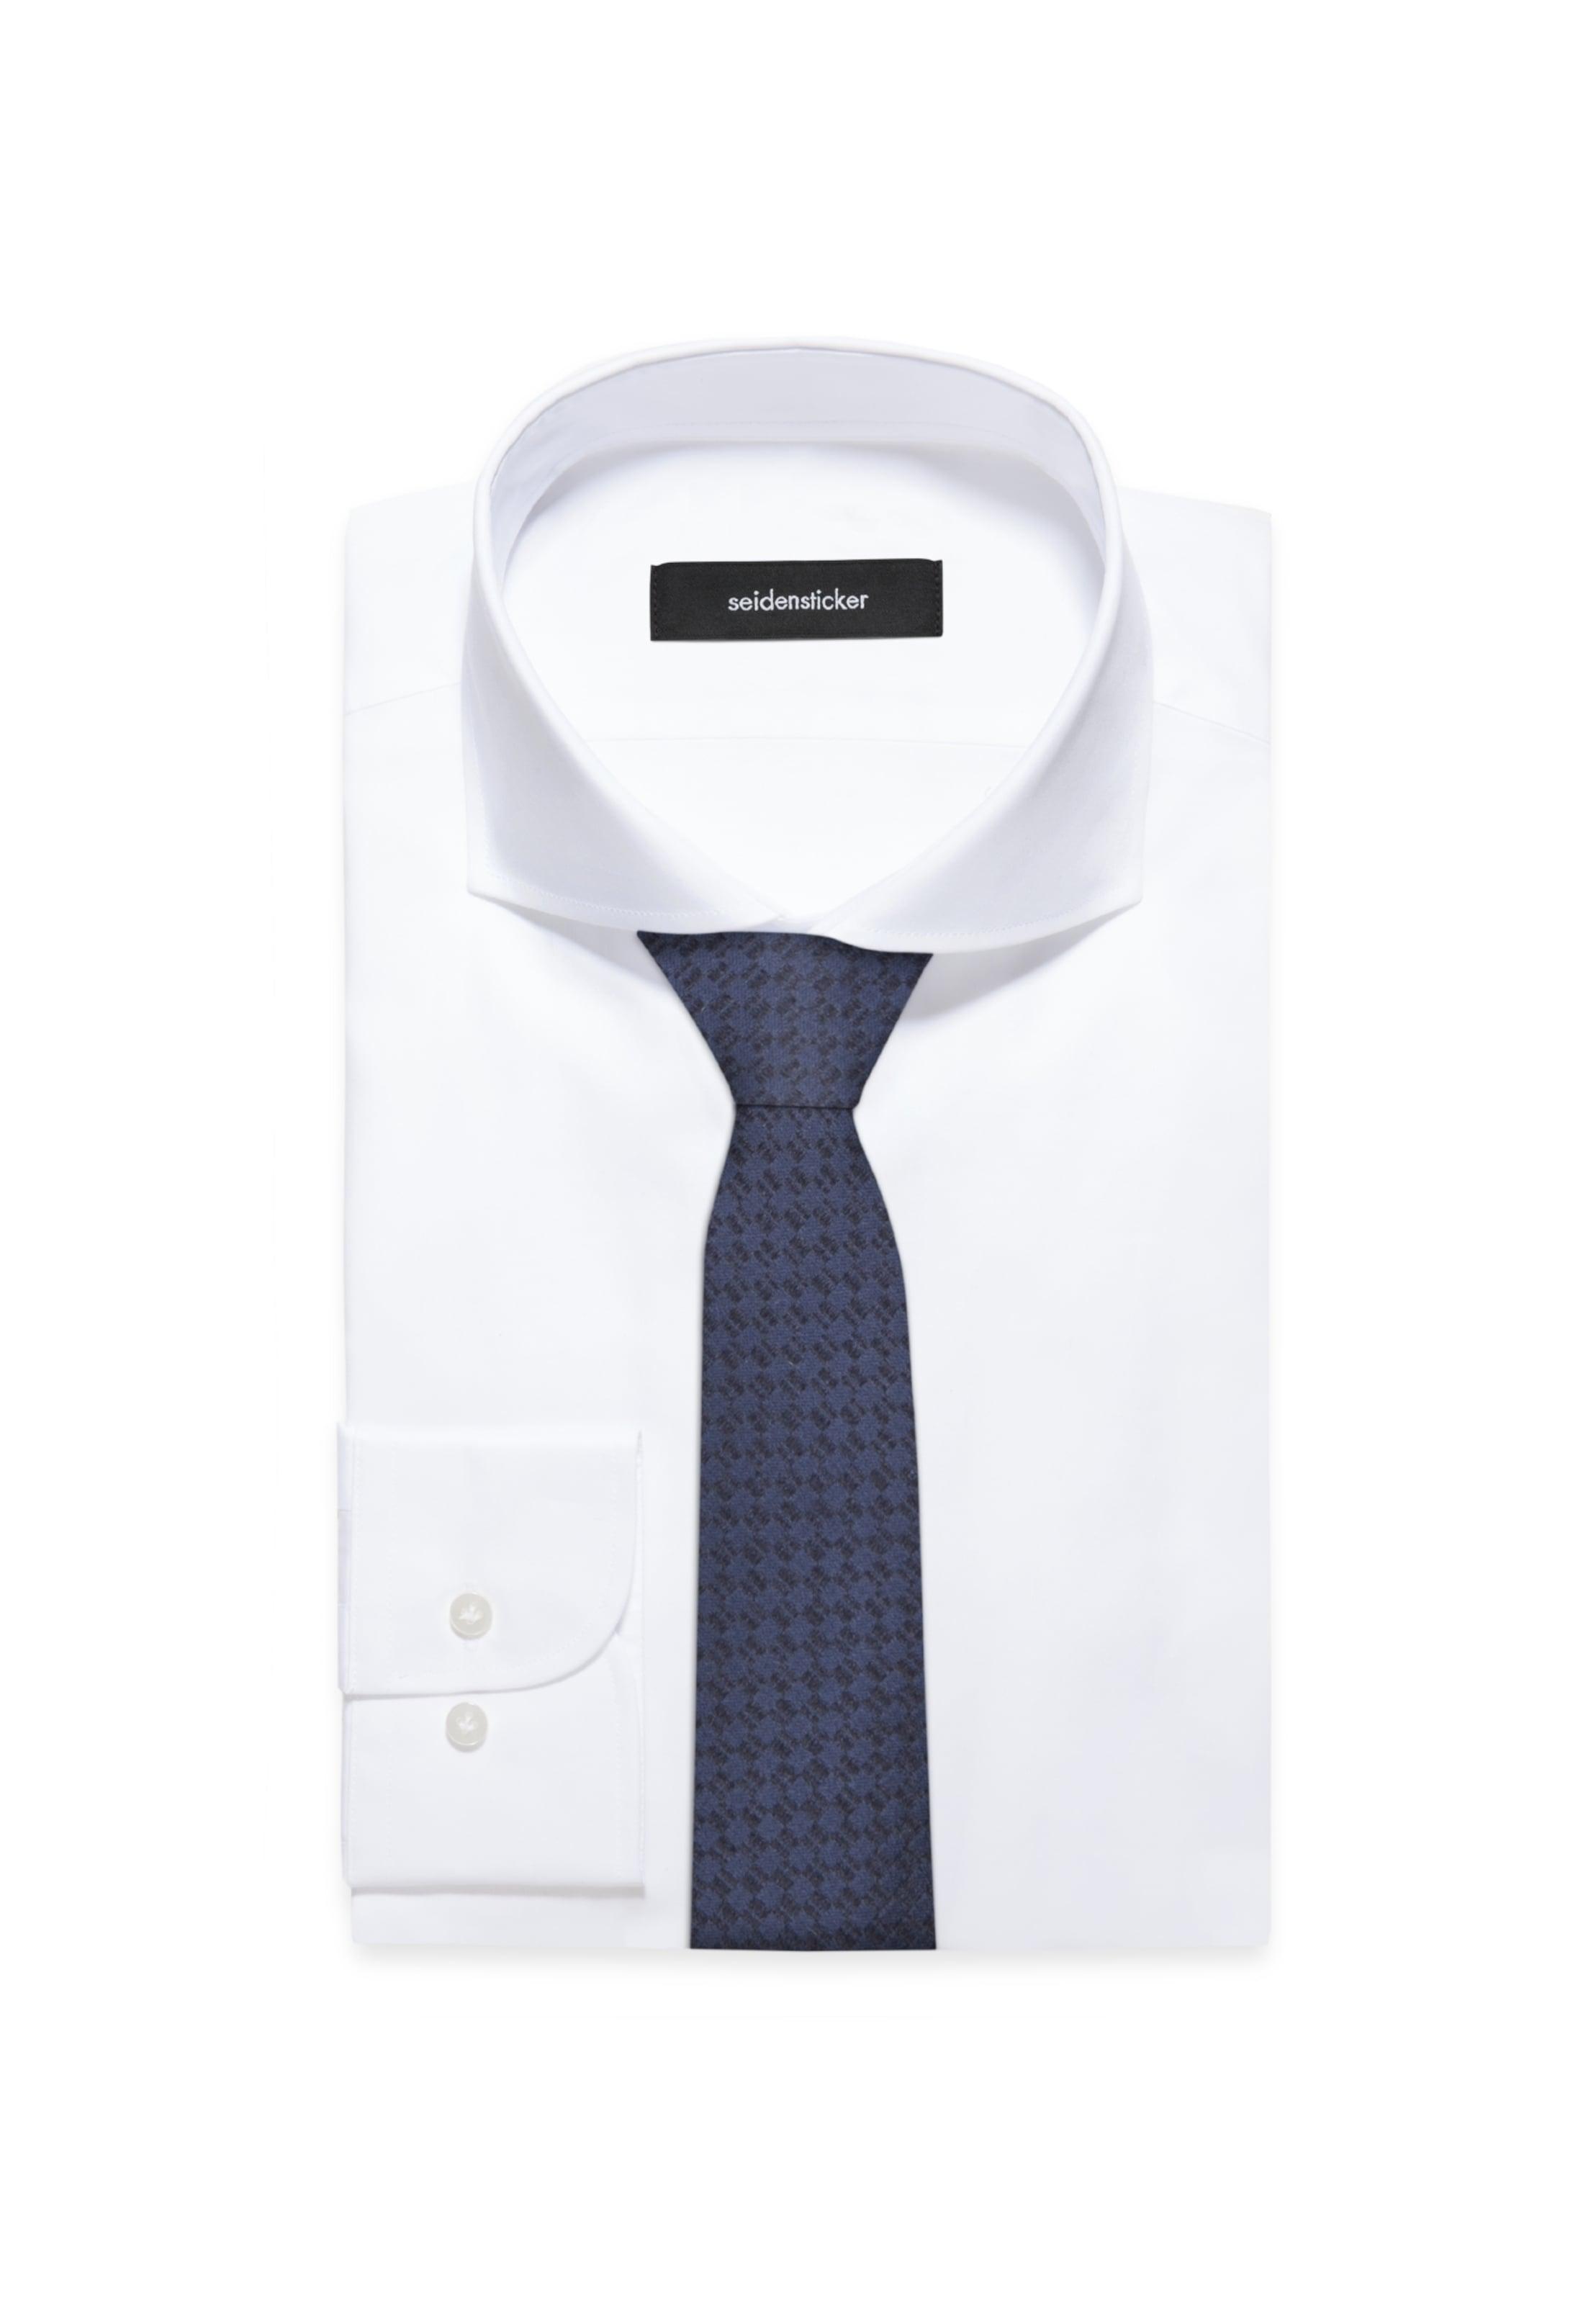 Cravate En Marine En Cravate Seidensticker Seidensticker cAj3q45SLR